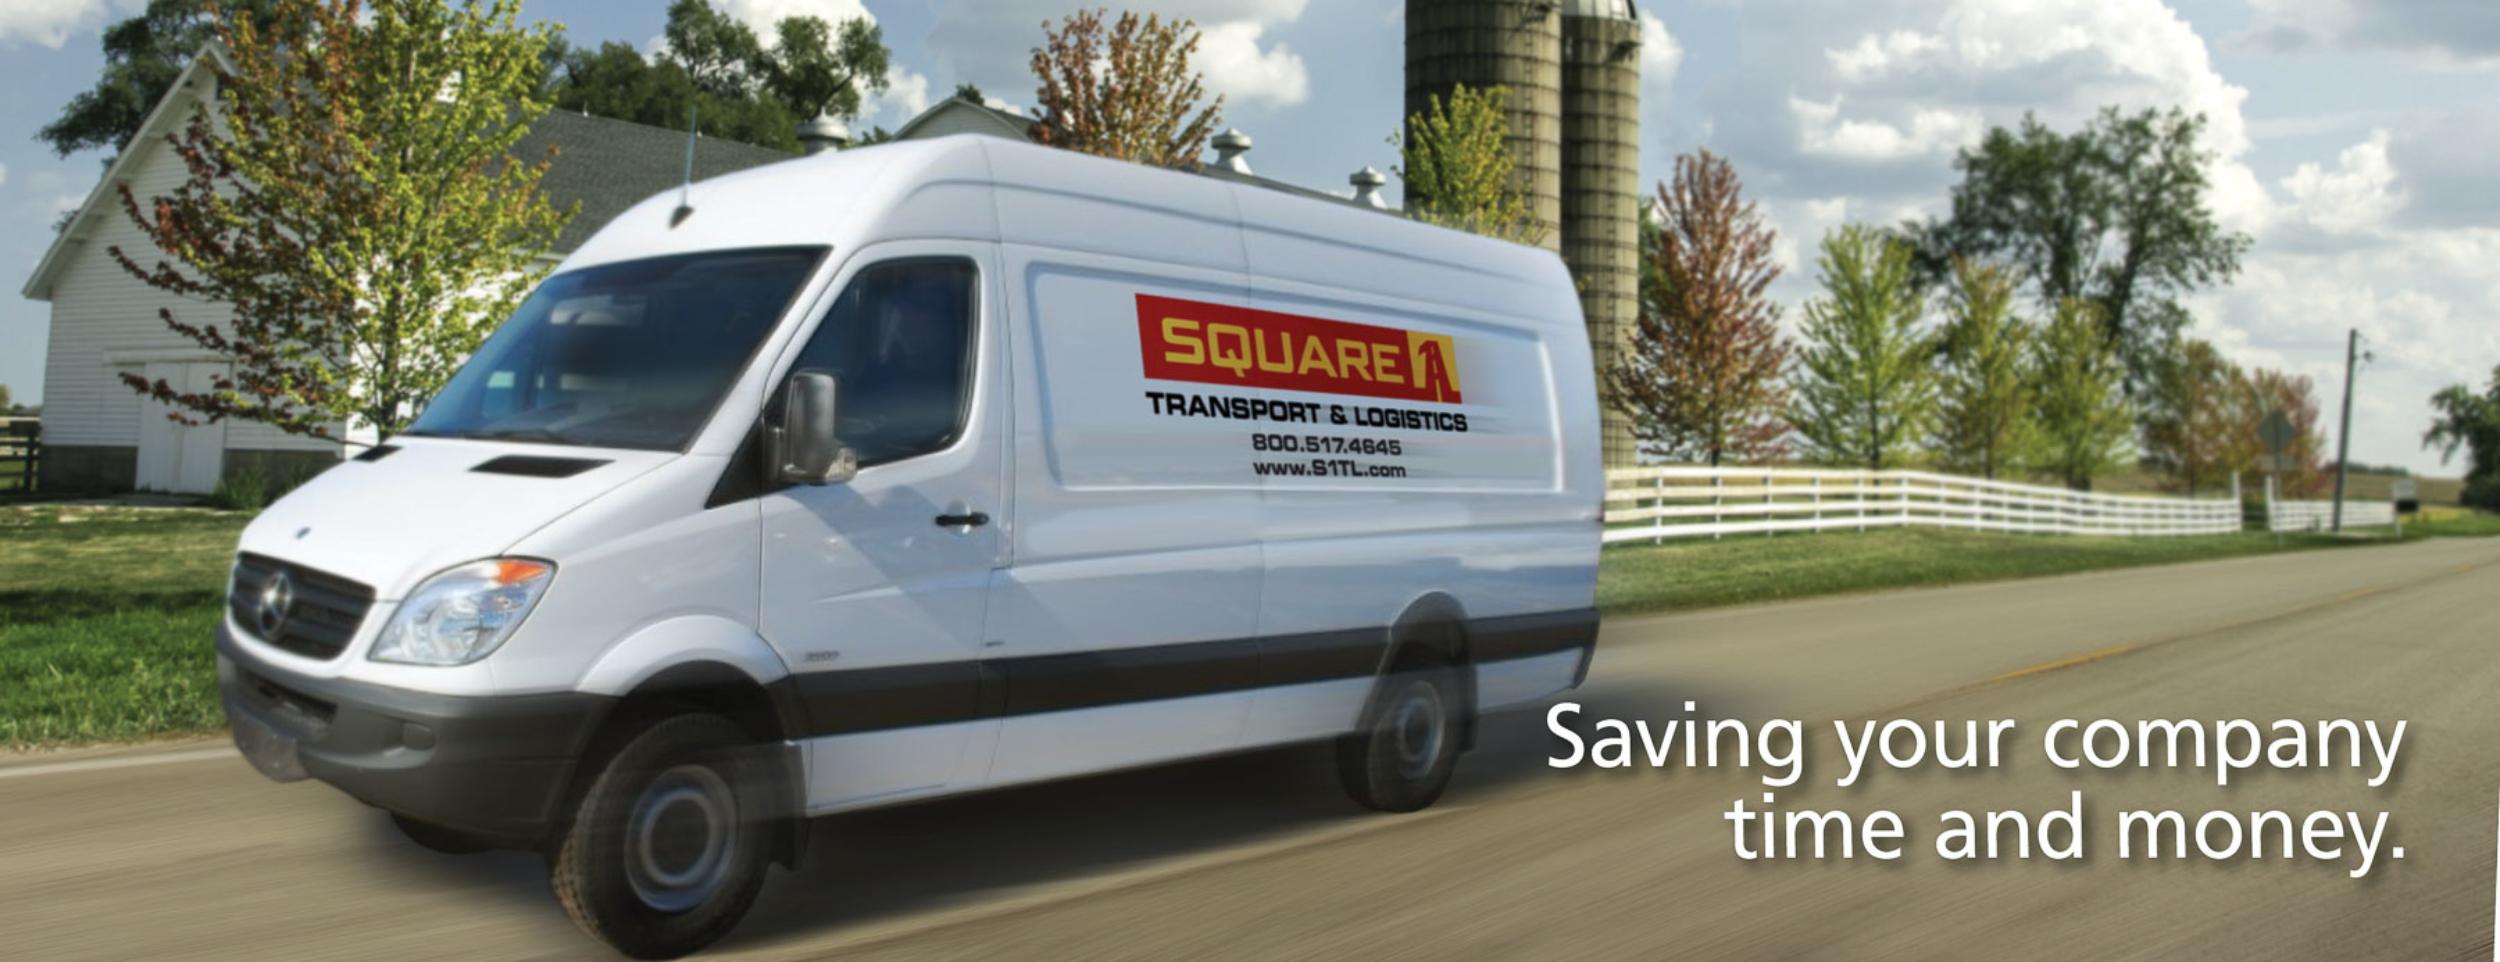 Square-One-Transport-Logistics 16